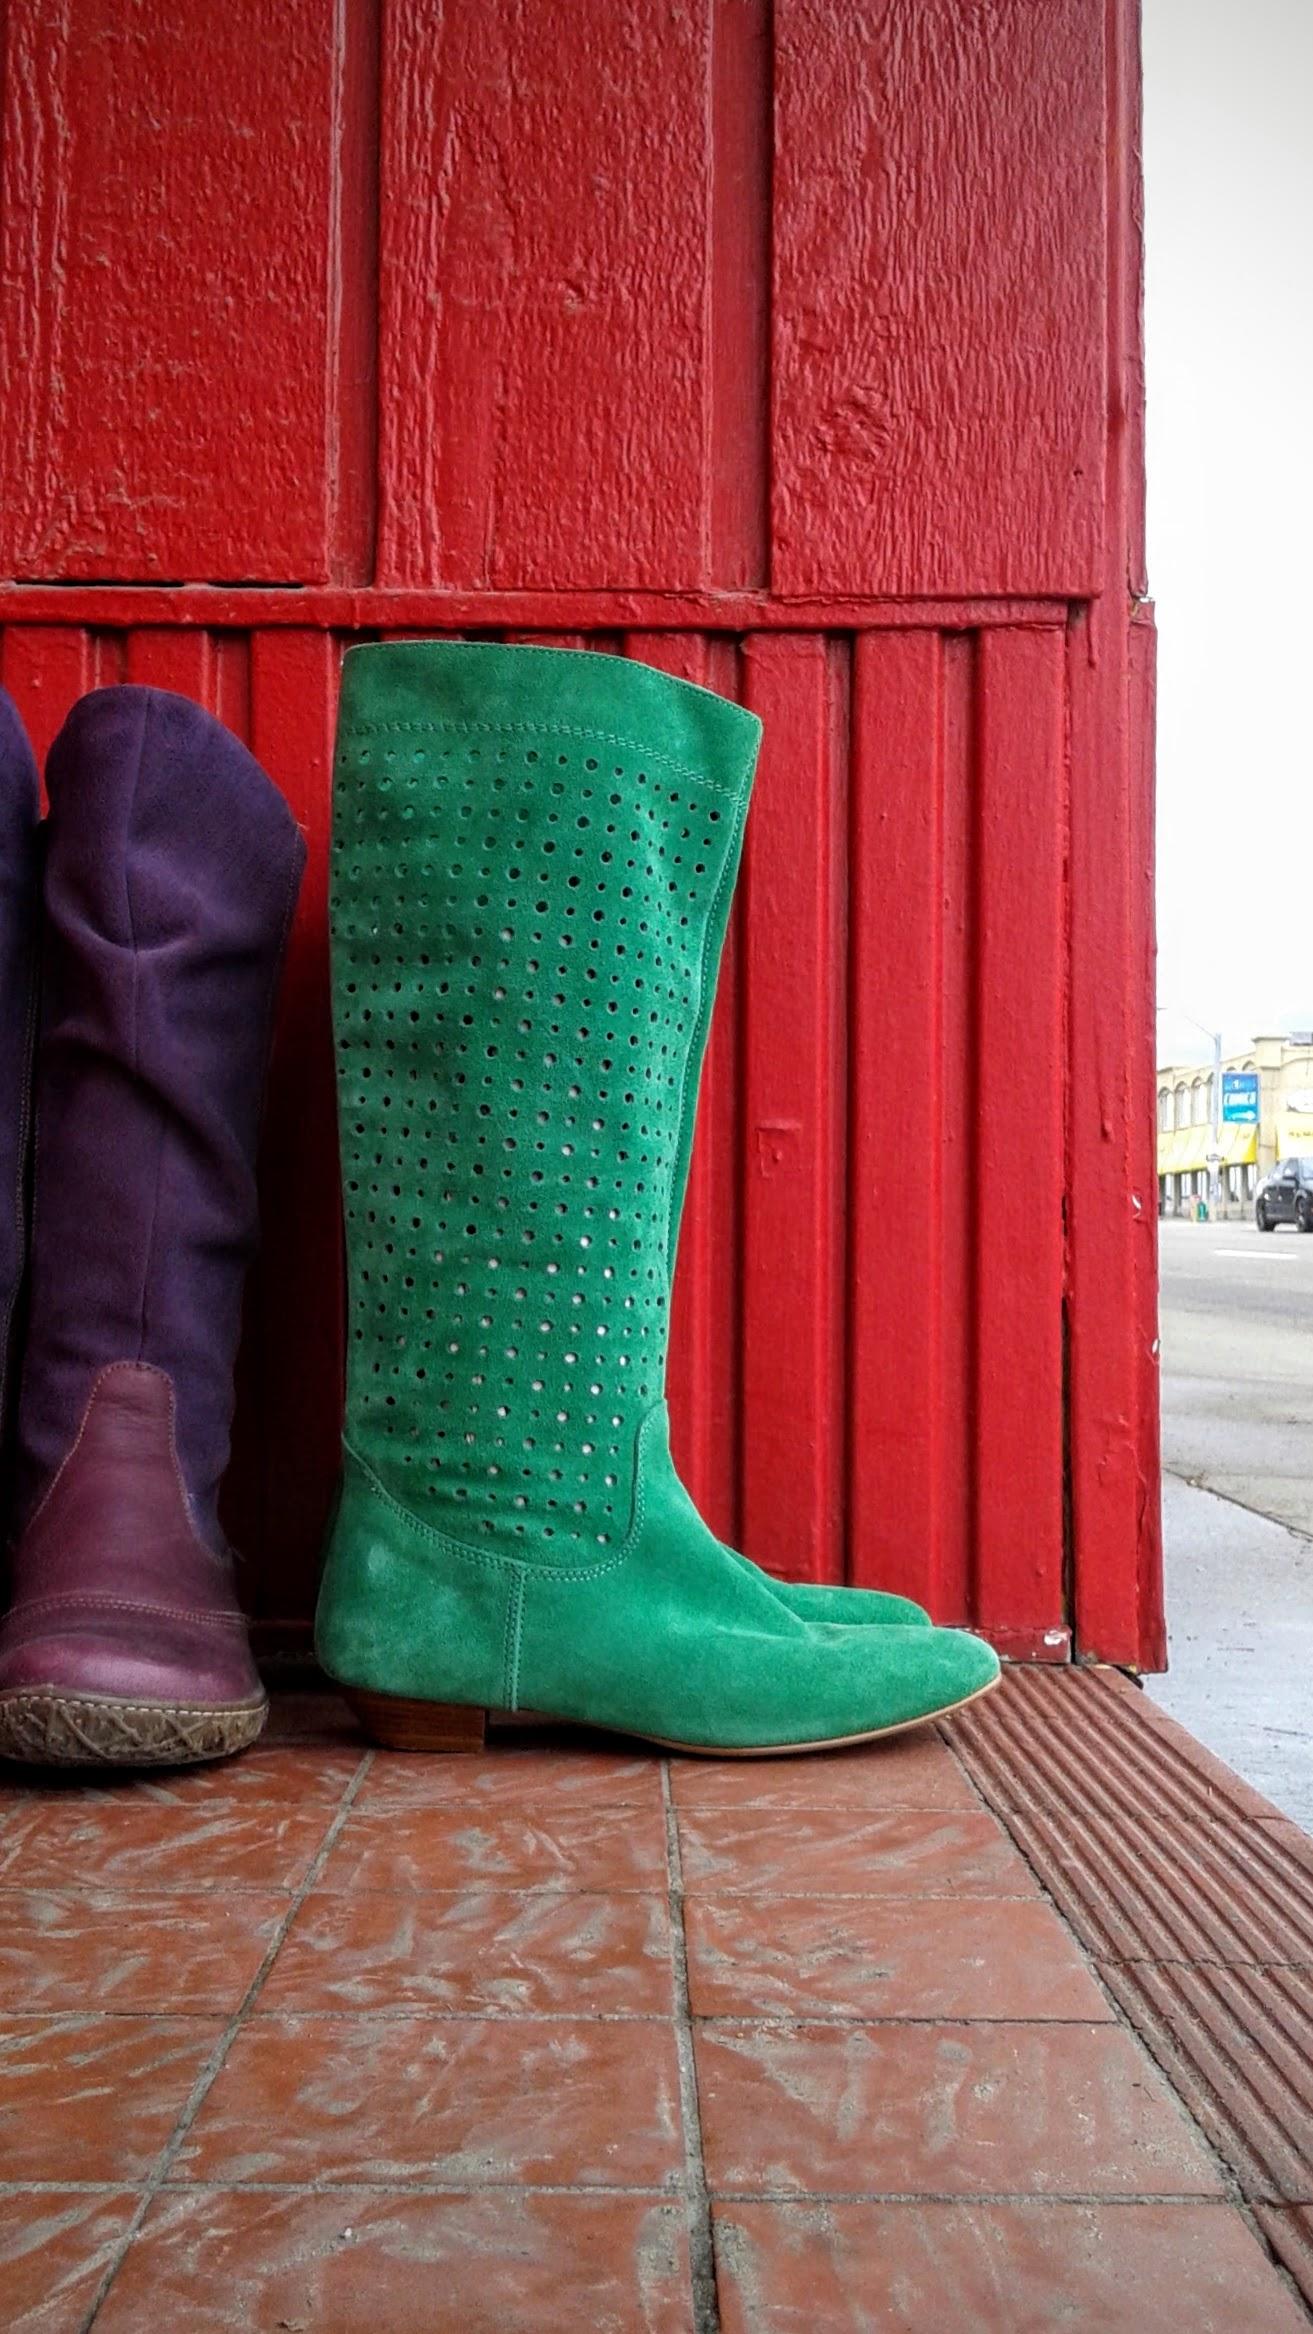 El Natutalista  purple boots, S8, $85;Green Suede  Aldo  boots, S8, $48